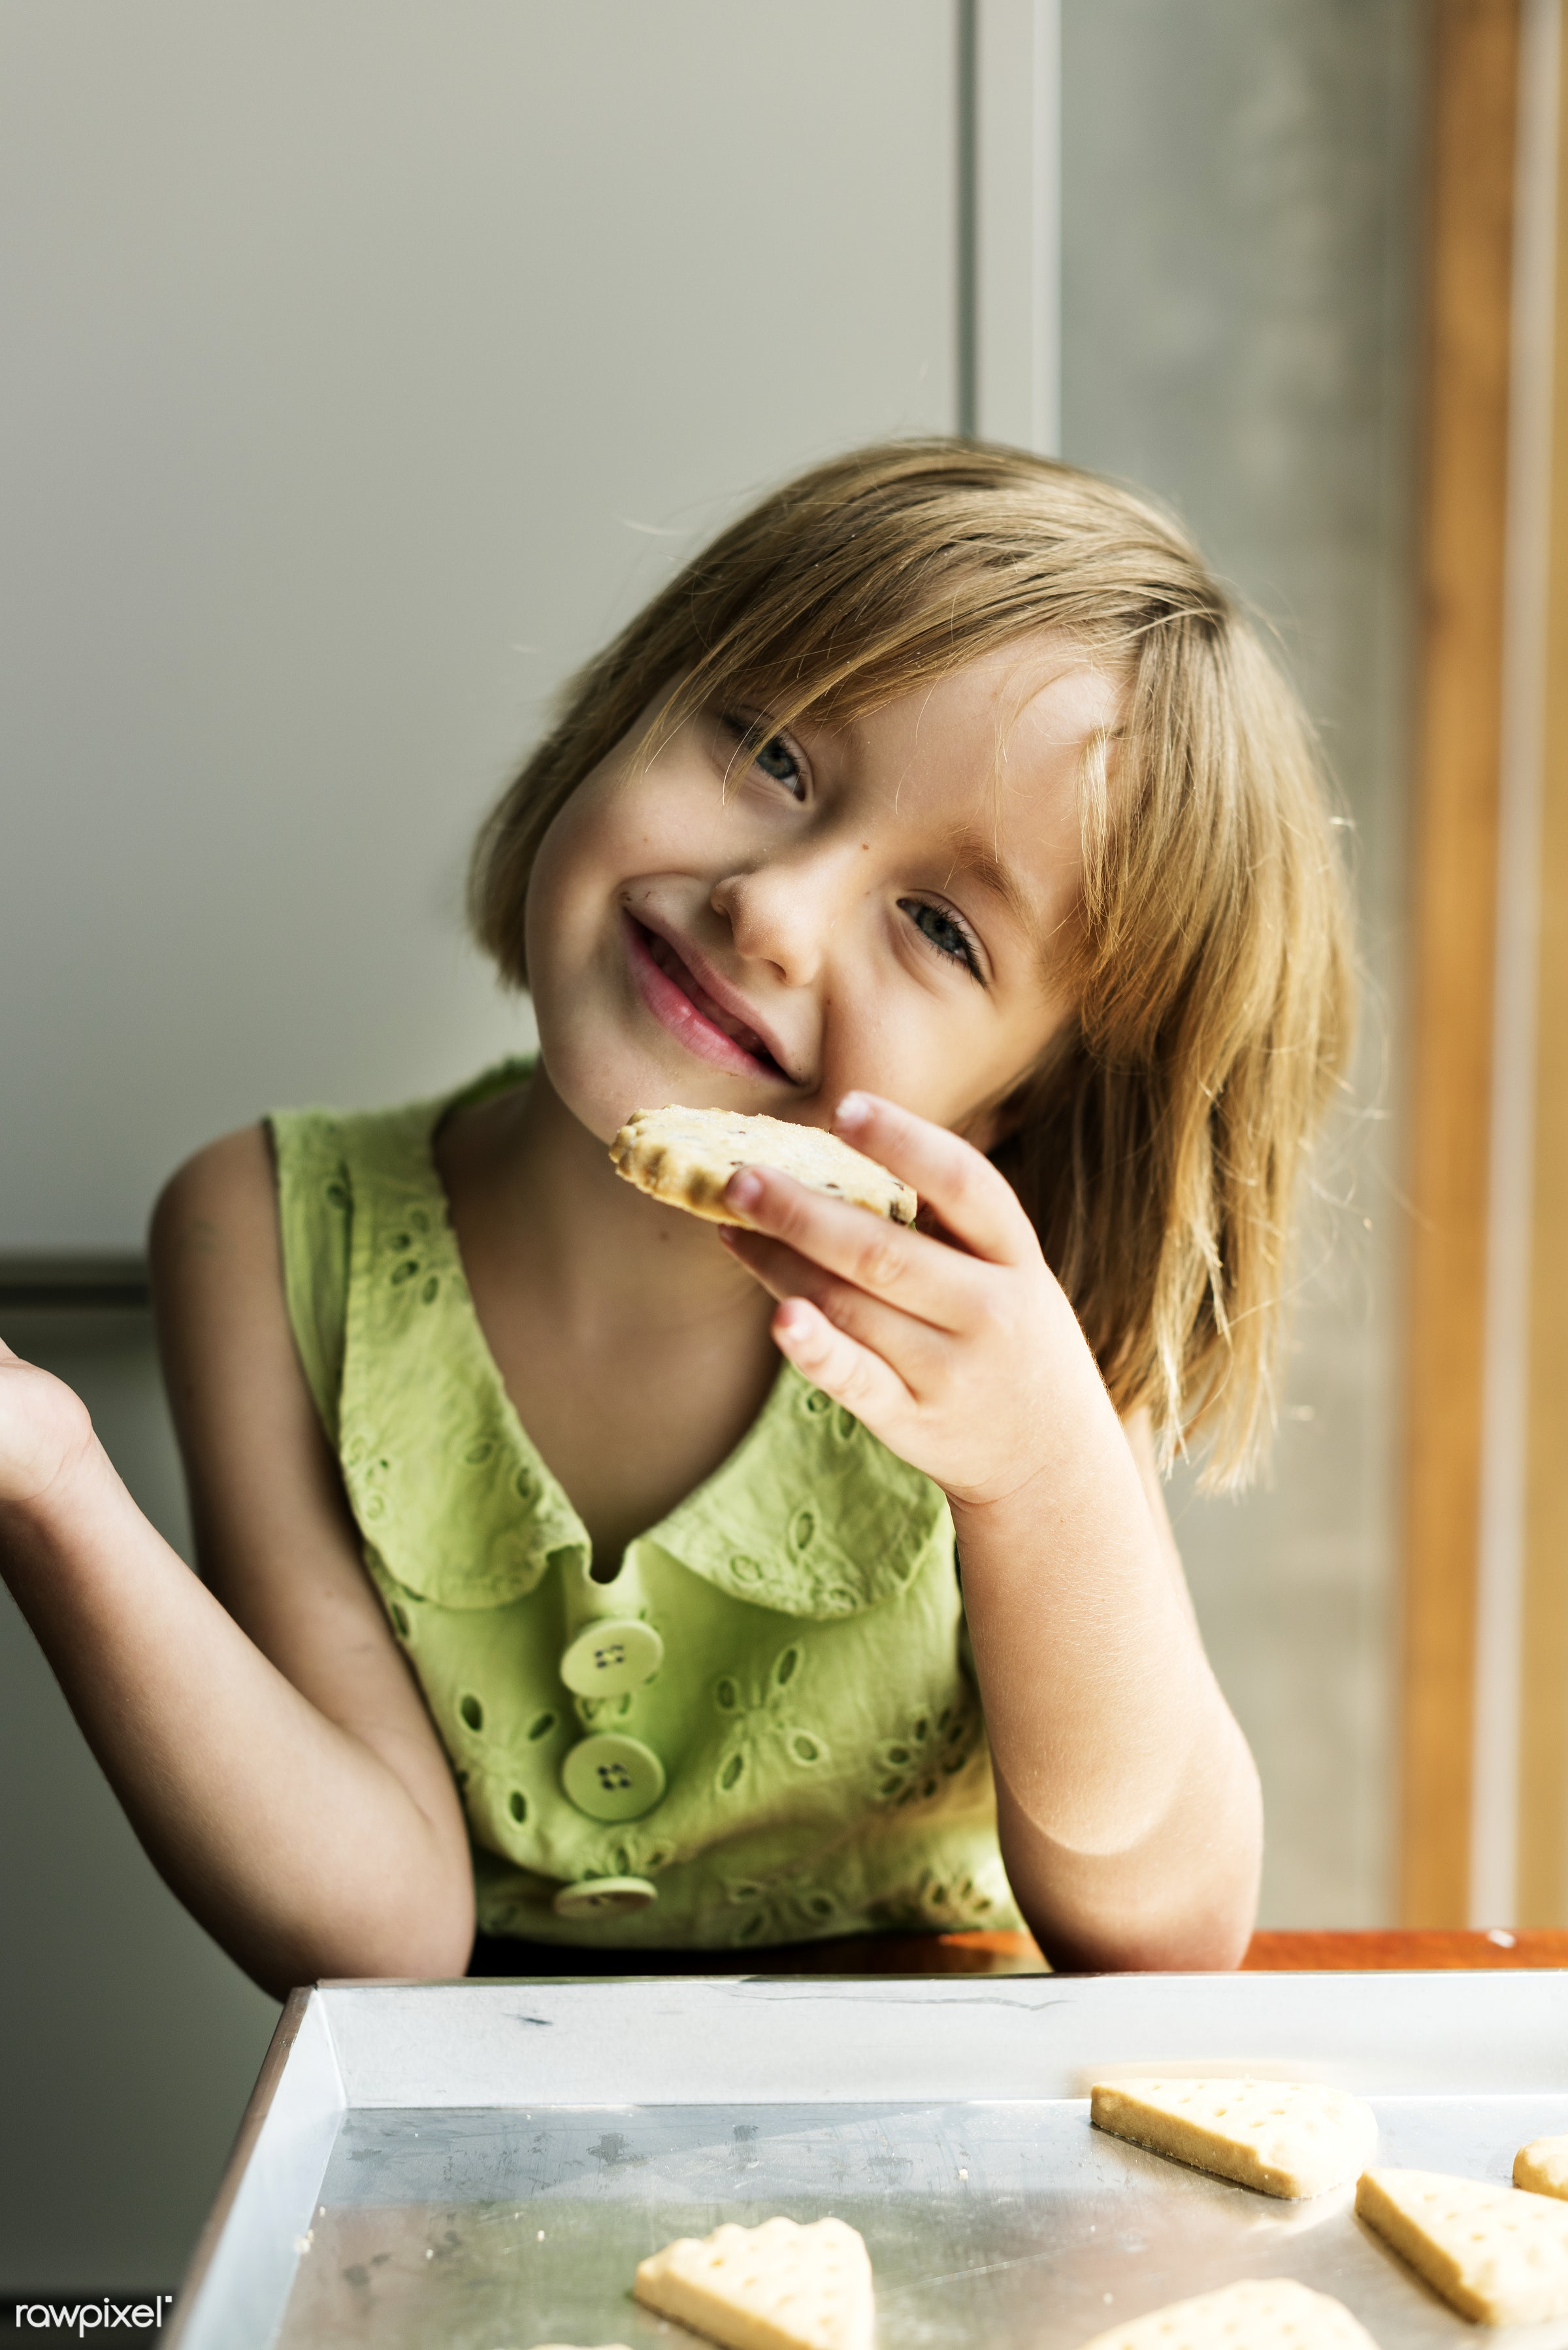 activity, alone, american, bake, baker, bakery, baking, biscuit, blond, caucasian, child, closeup, cookies, daughter,...